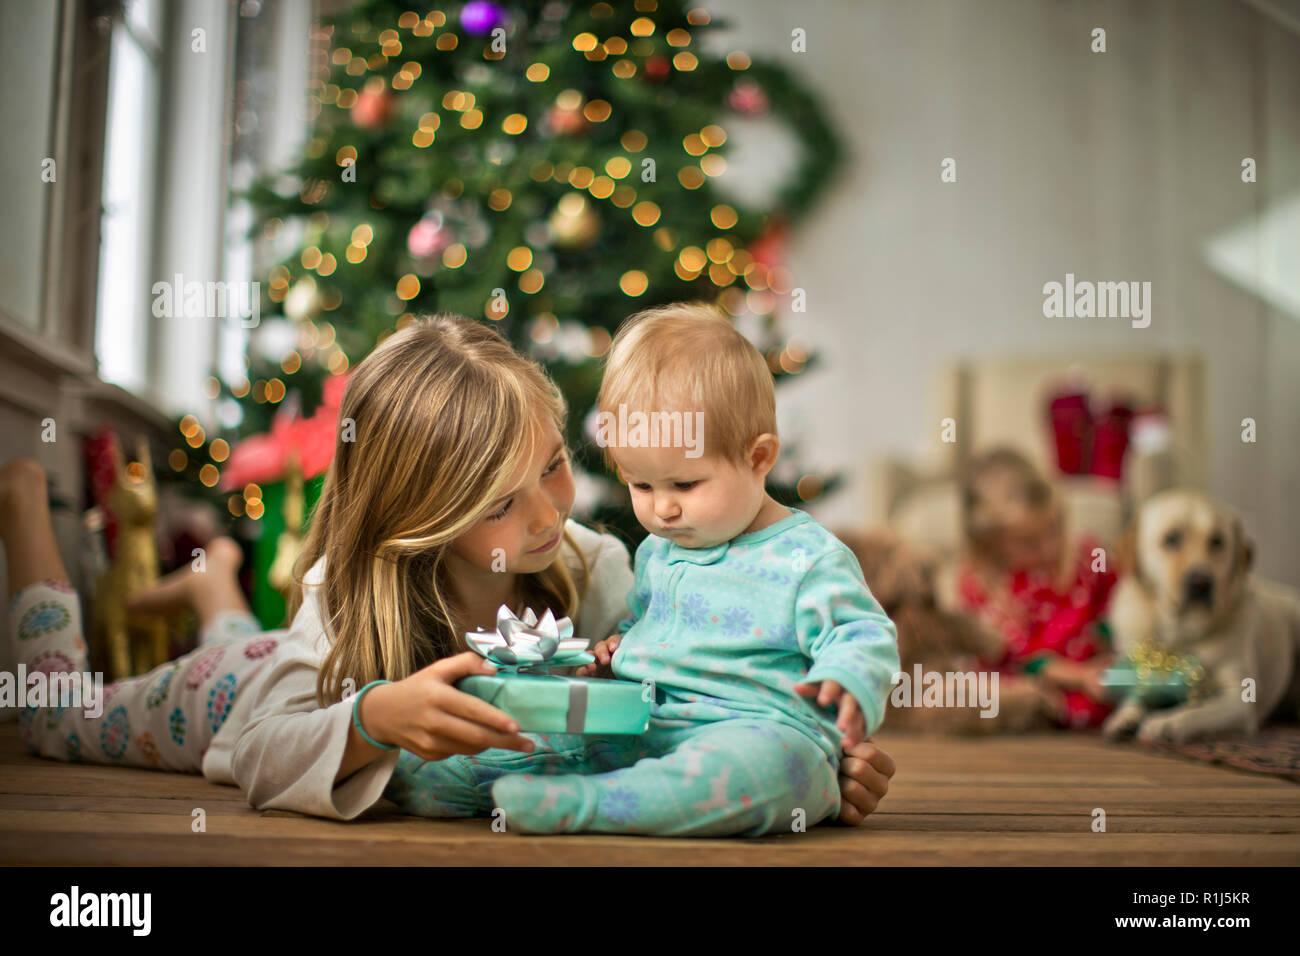 Young girl giving her baby sister a Christmas present. - Stock Image